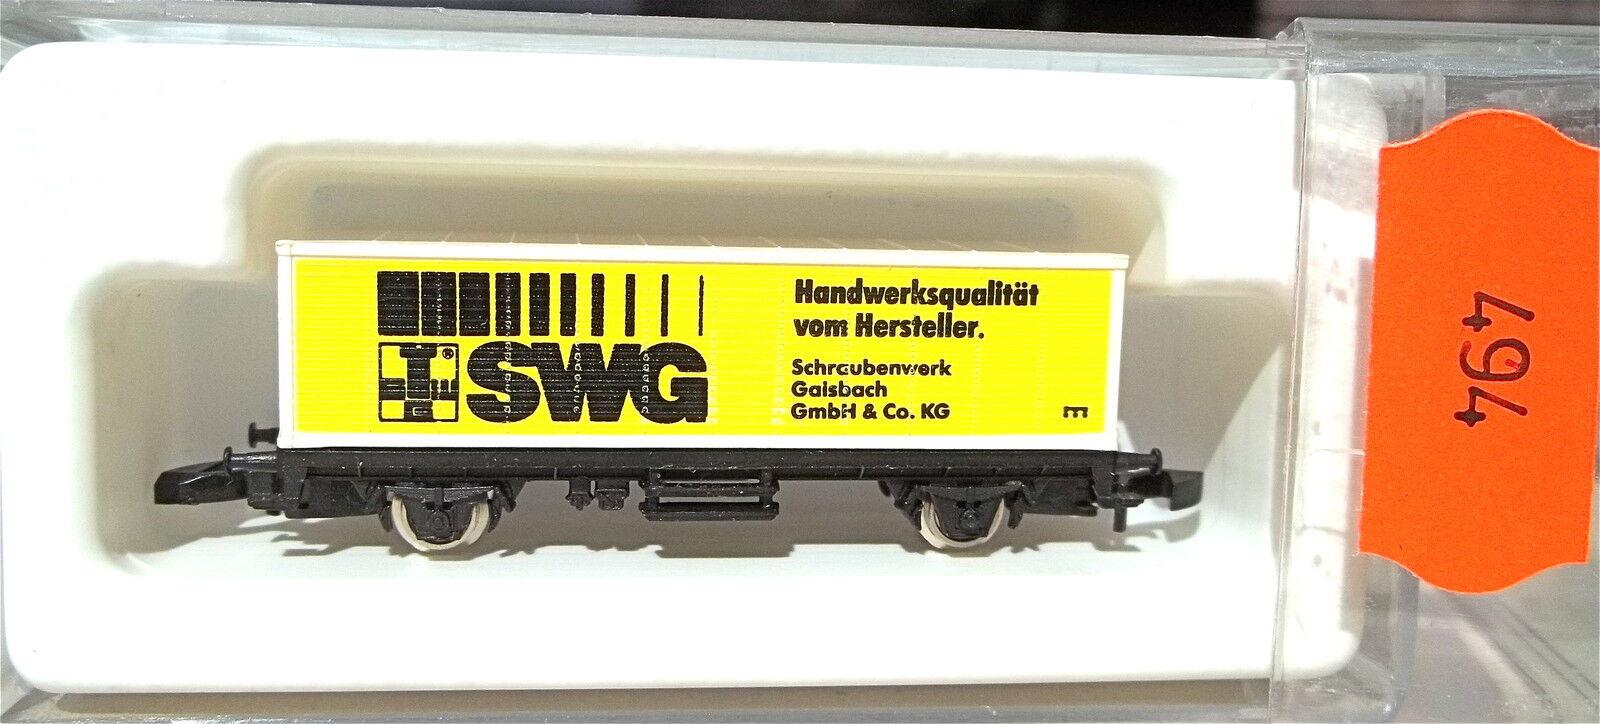 Swg Viti Vagone per Container Kolls 89704   8615 Scala Z 1/220 494   Å